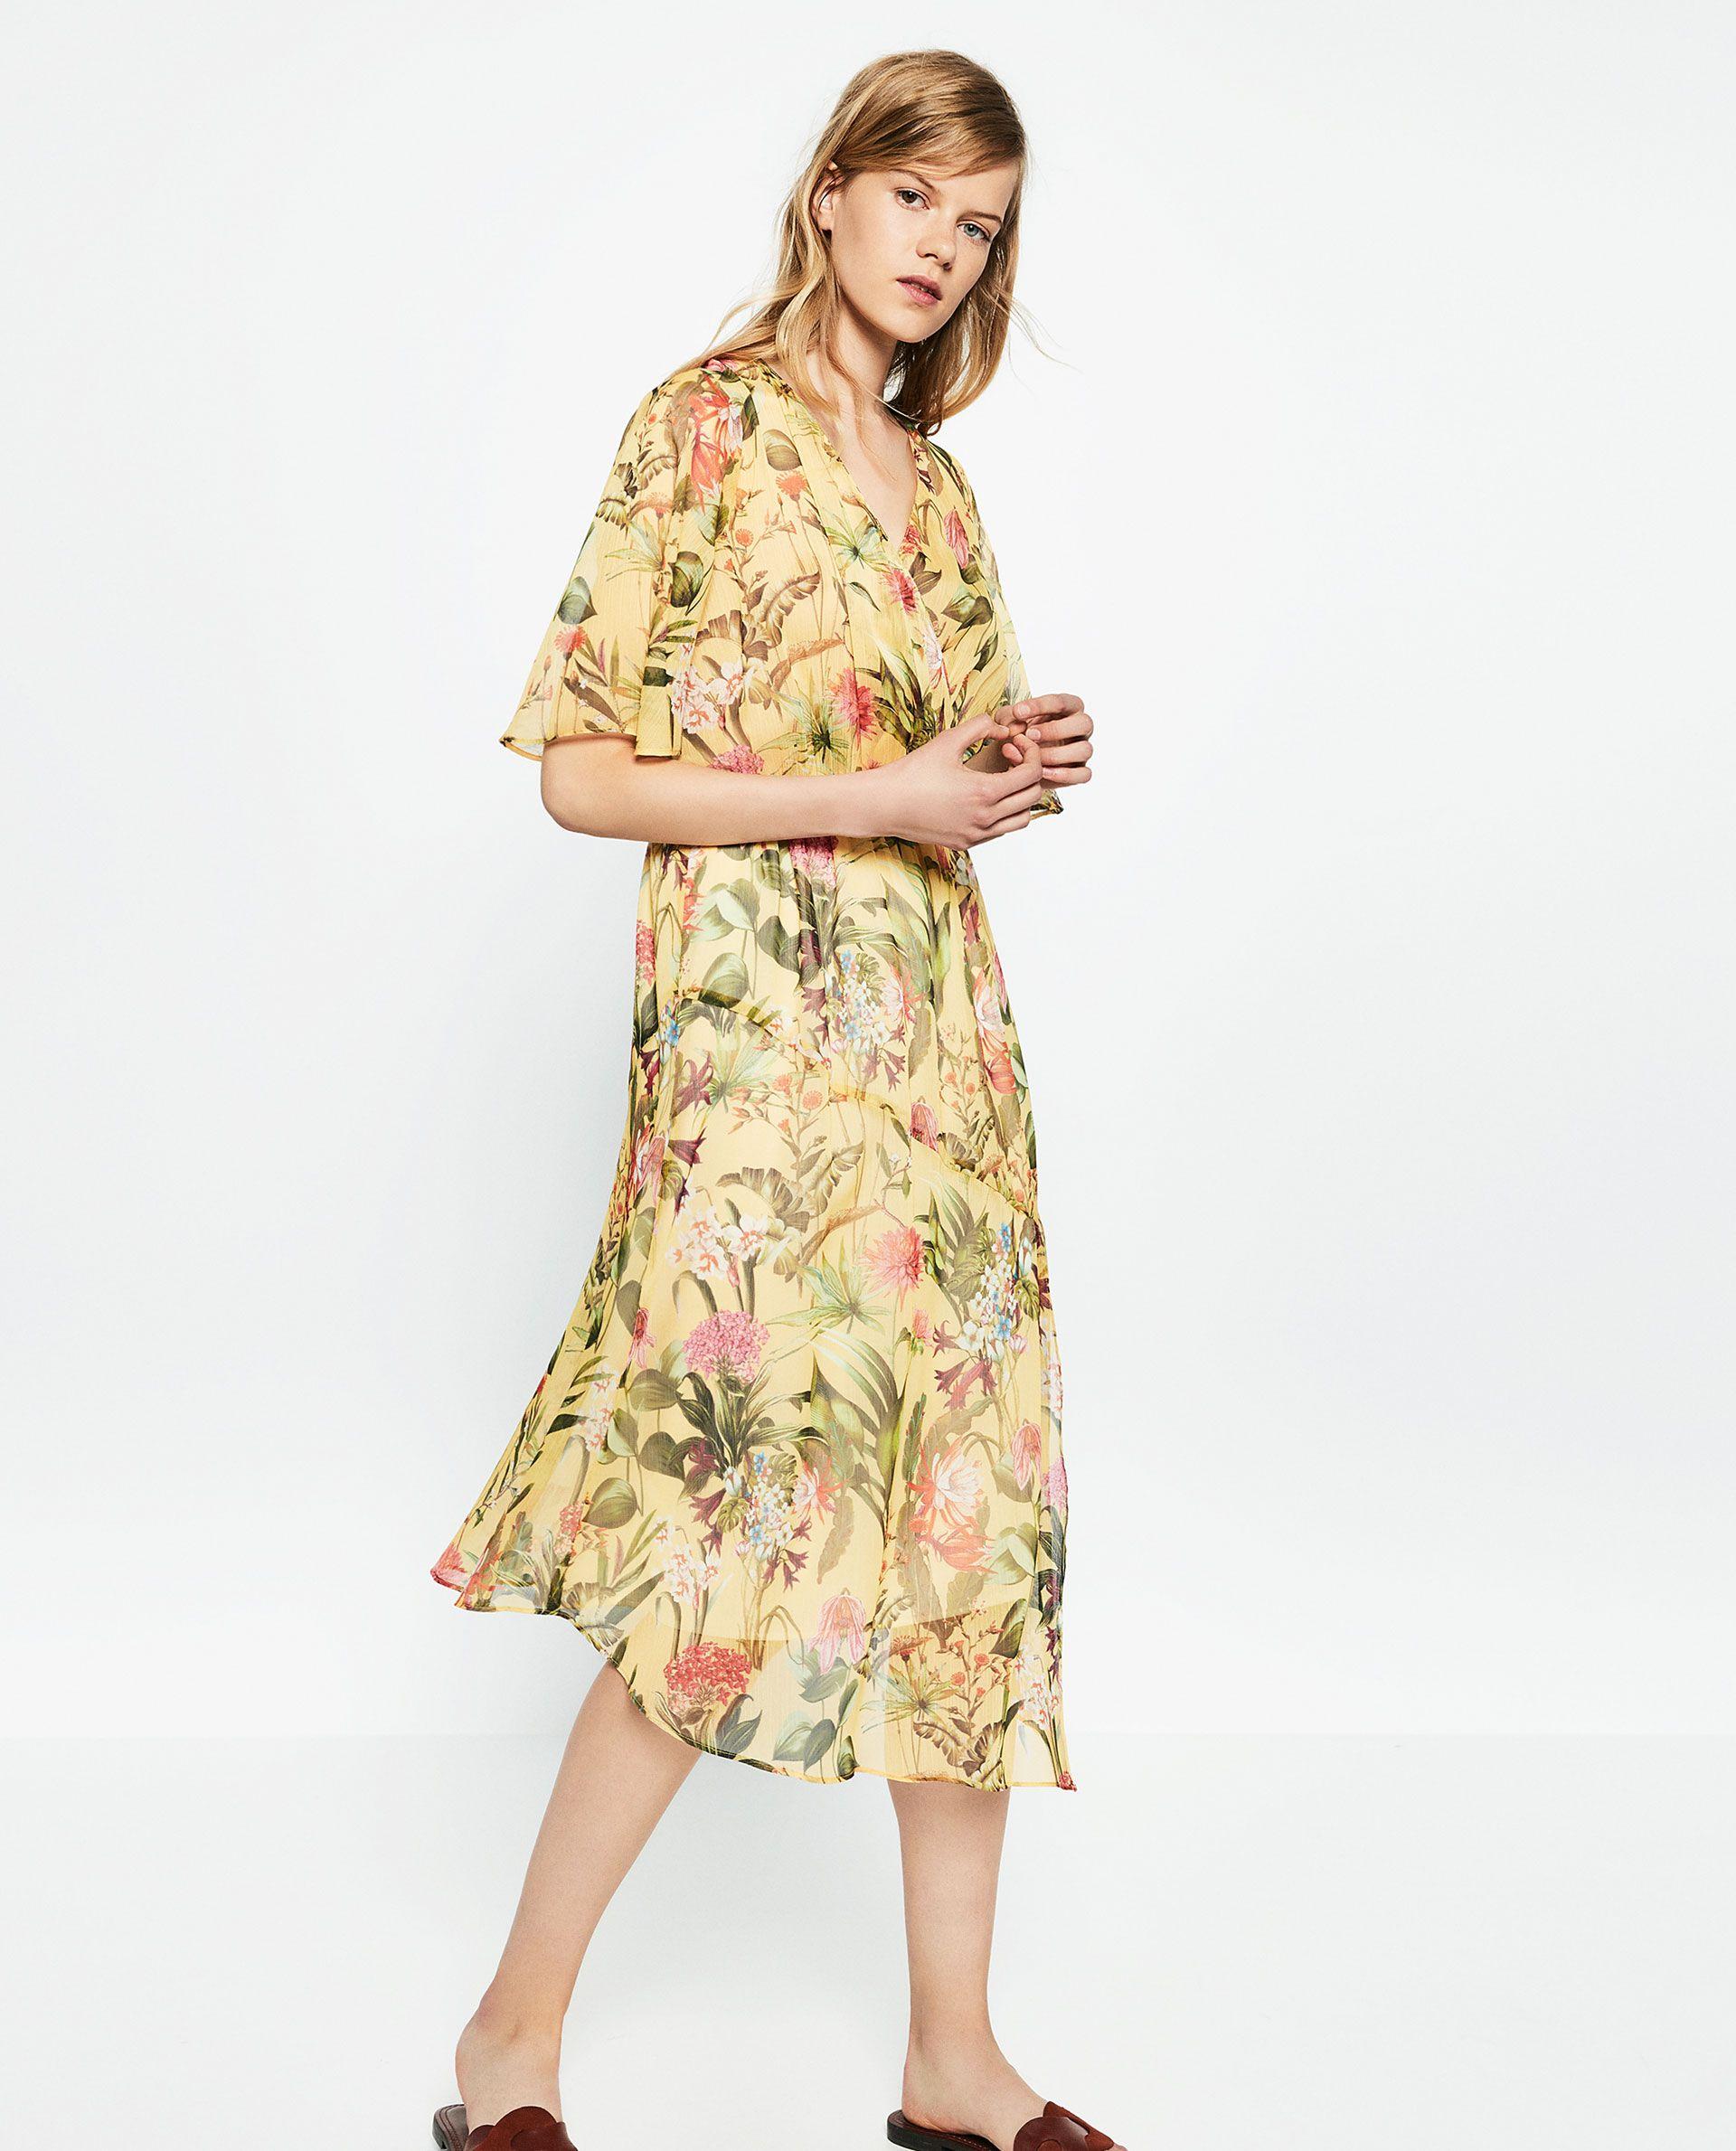 Fashion style Budget on a Shoppingboho for woman